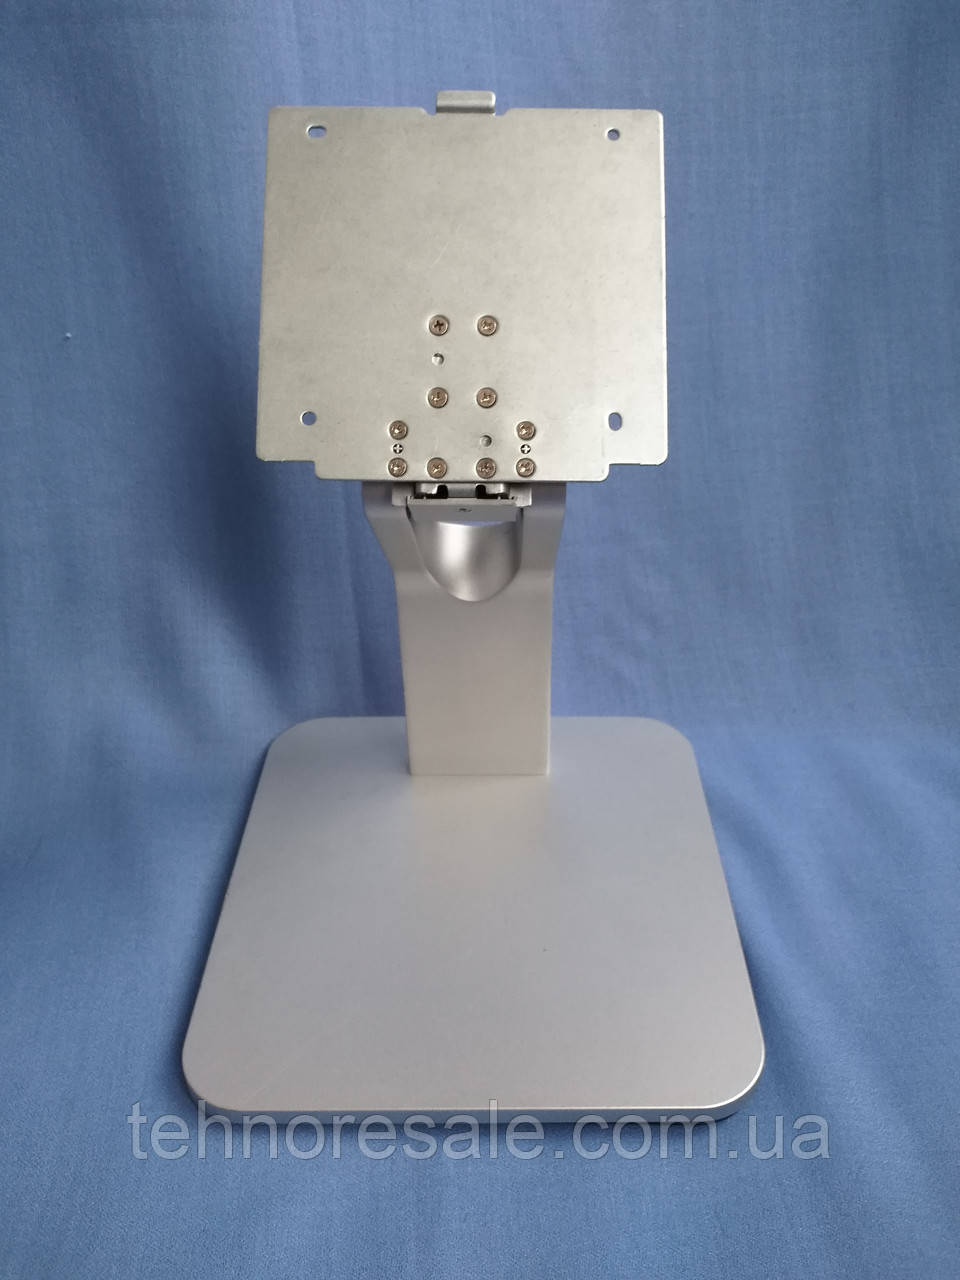 Подставка (ножка) для моноблока DELL Optiplex 9010, 9020, оригинал